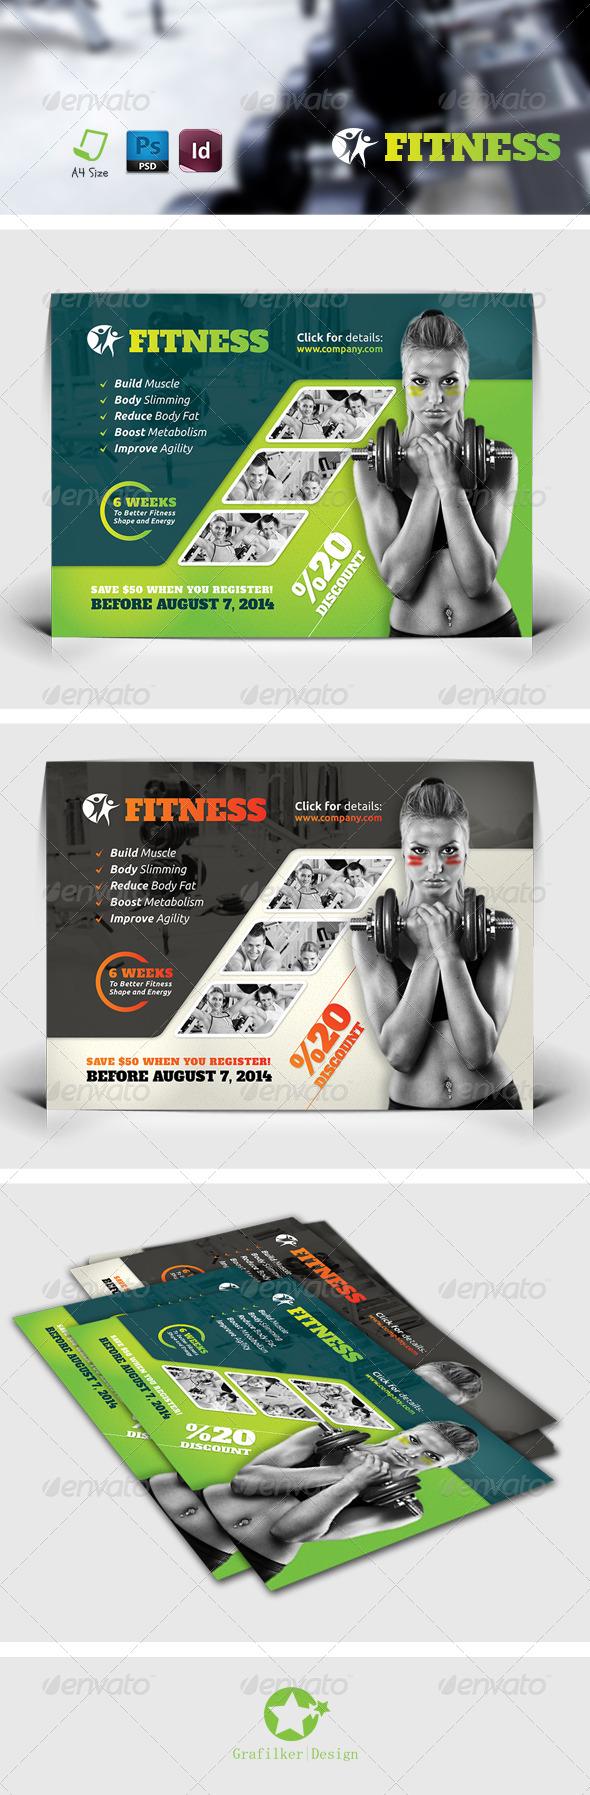 Fitness Salon Flyer Templates